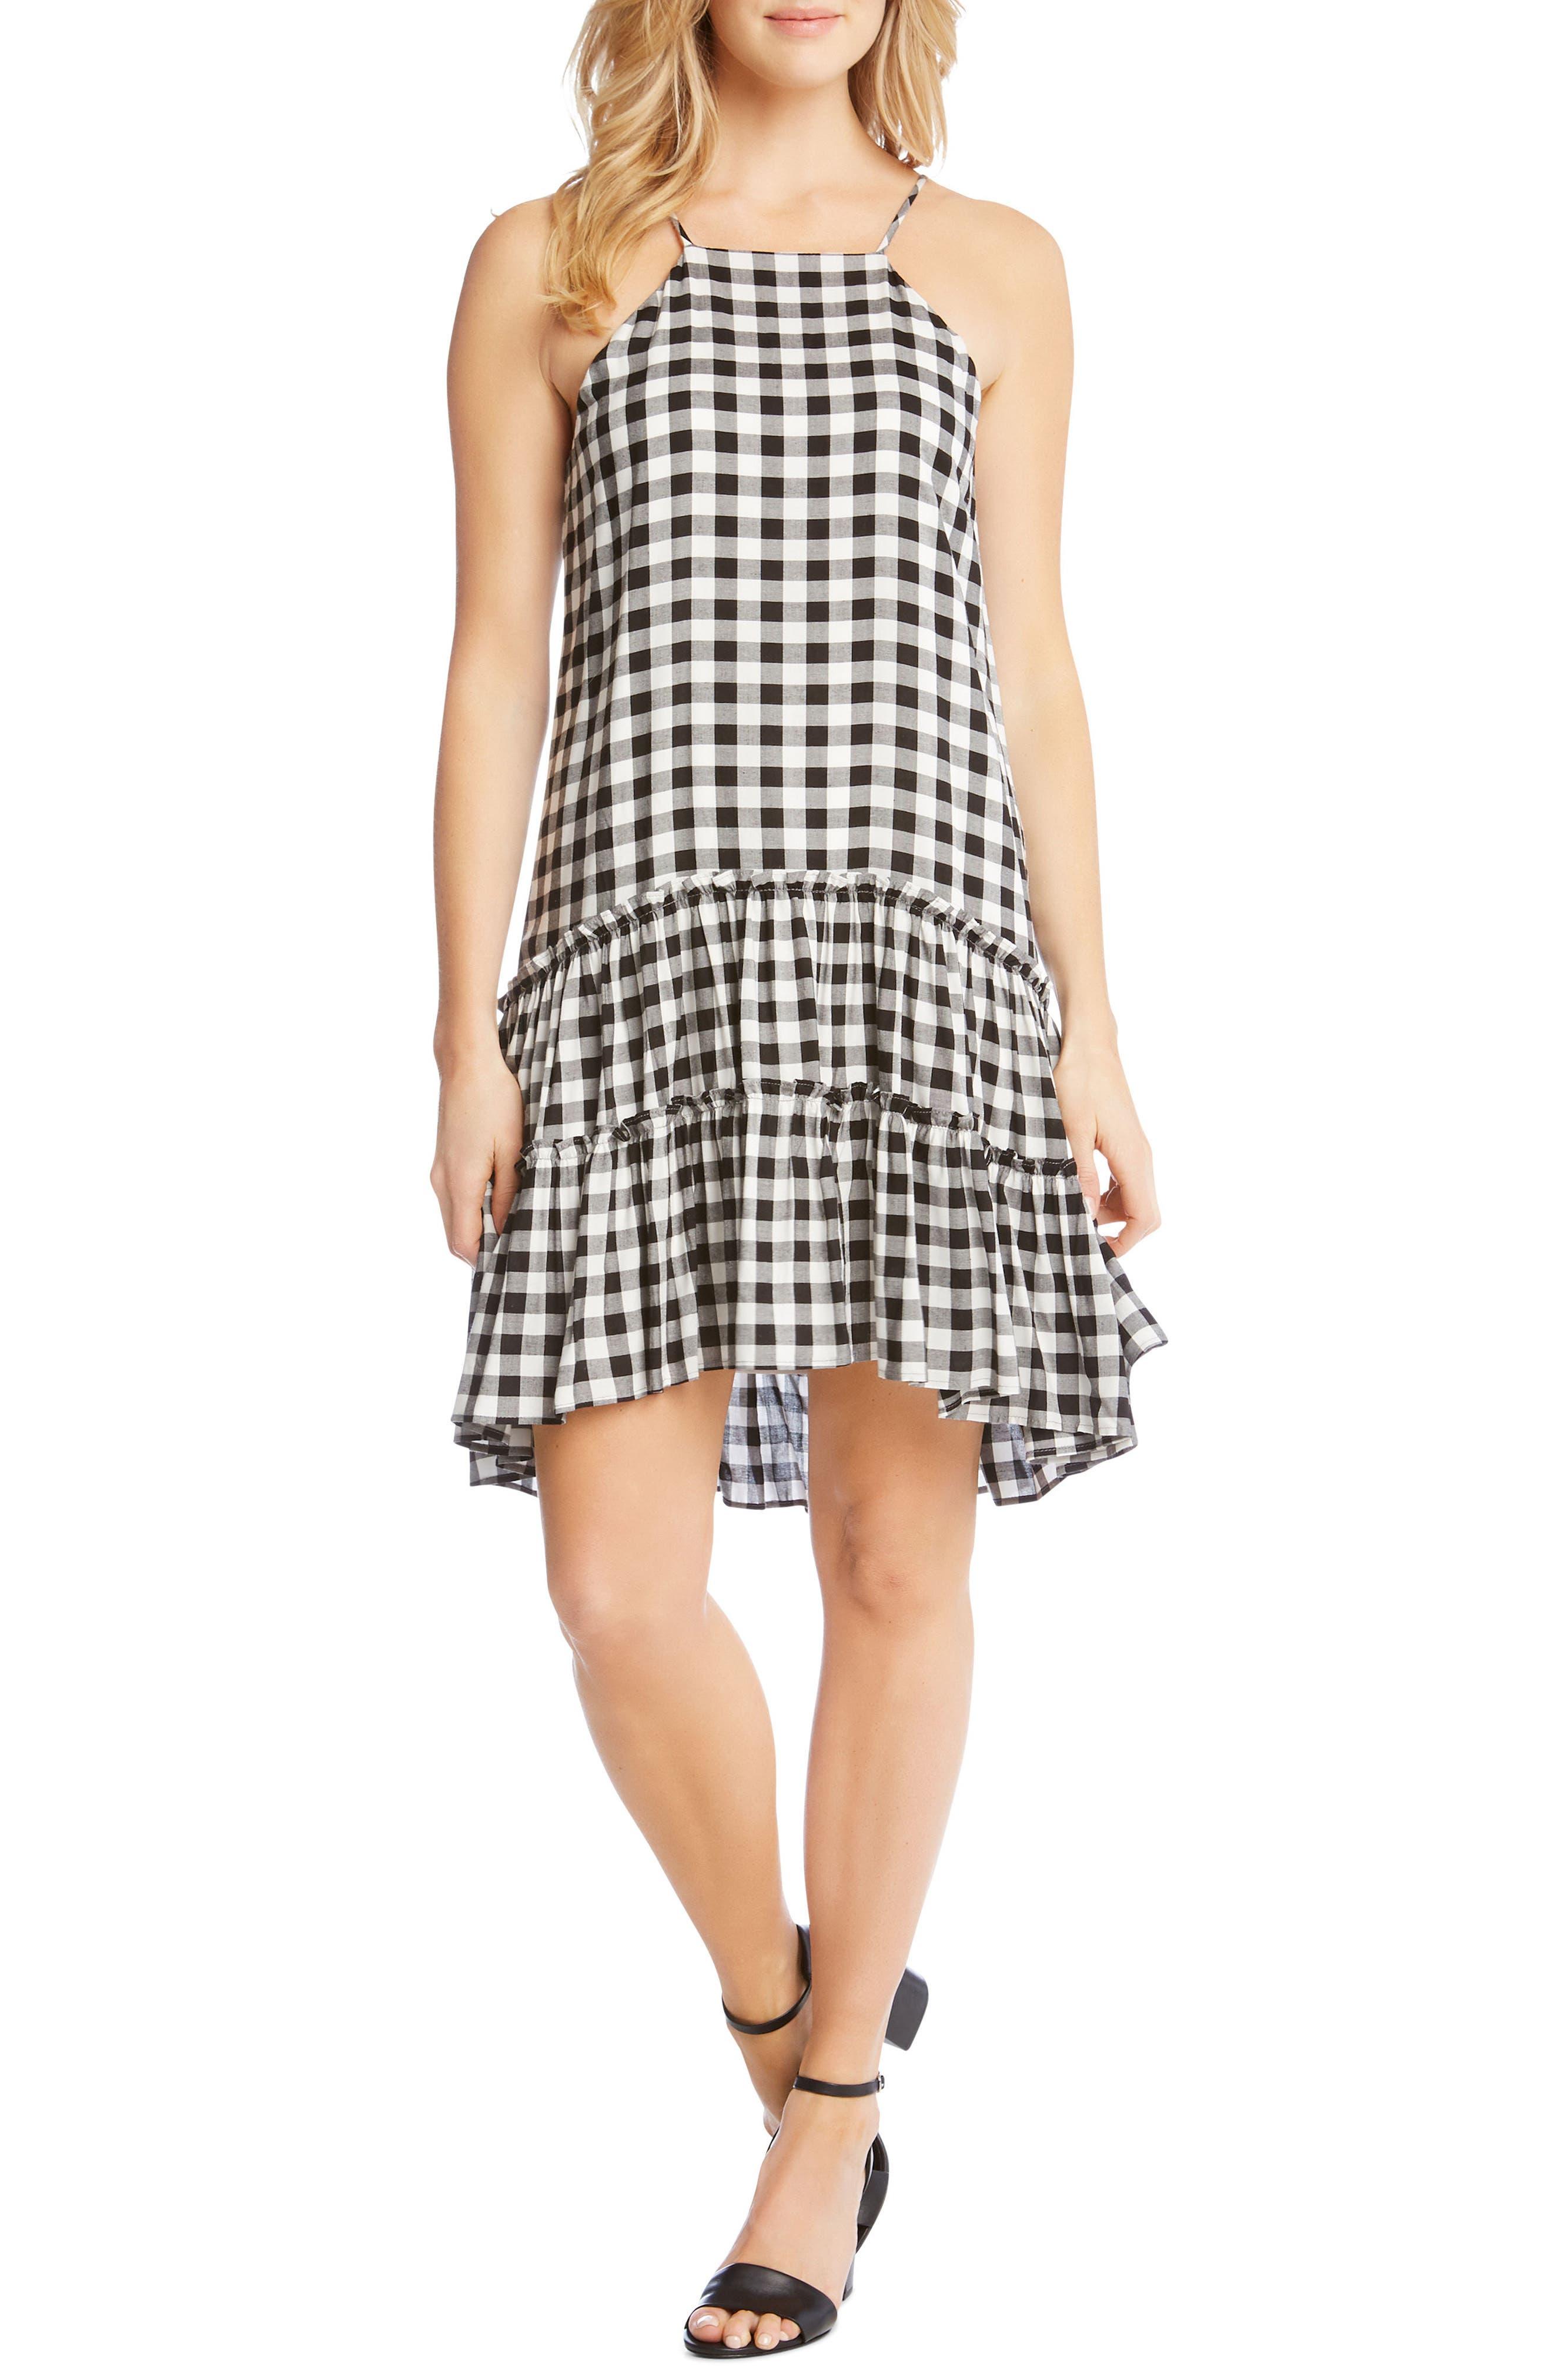 Gingham Ruffle Hem Halter Top Dress,                         Main,                         color, Check